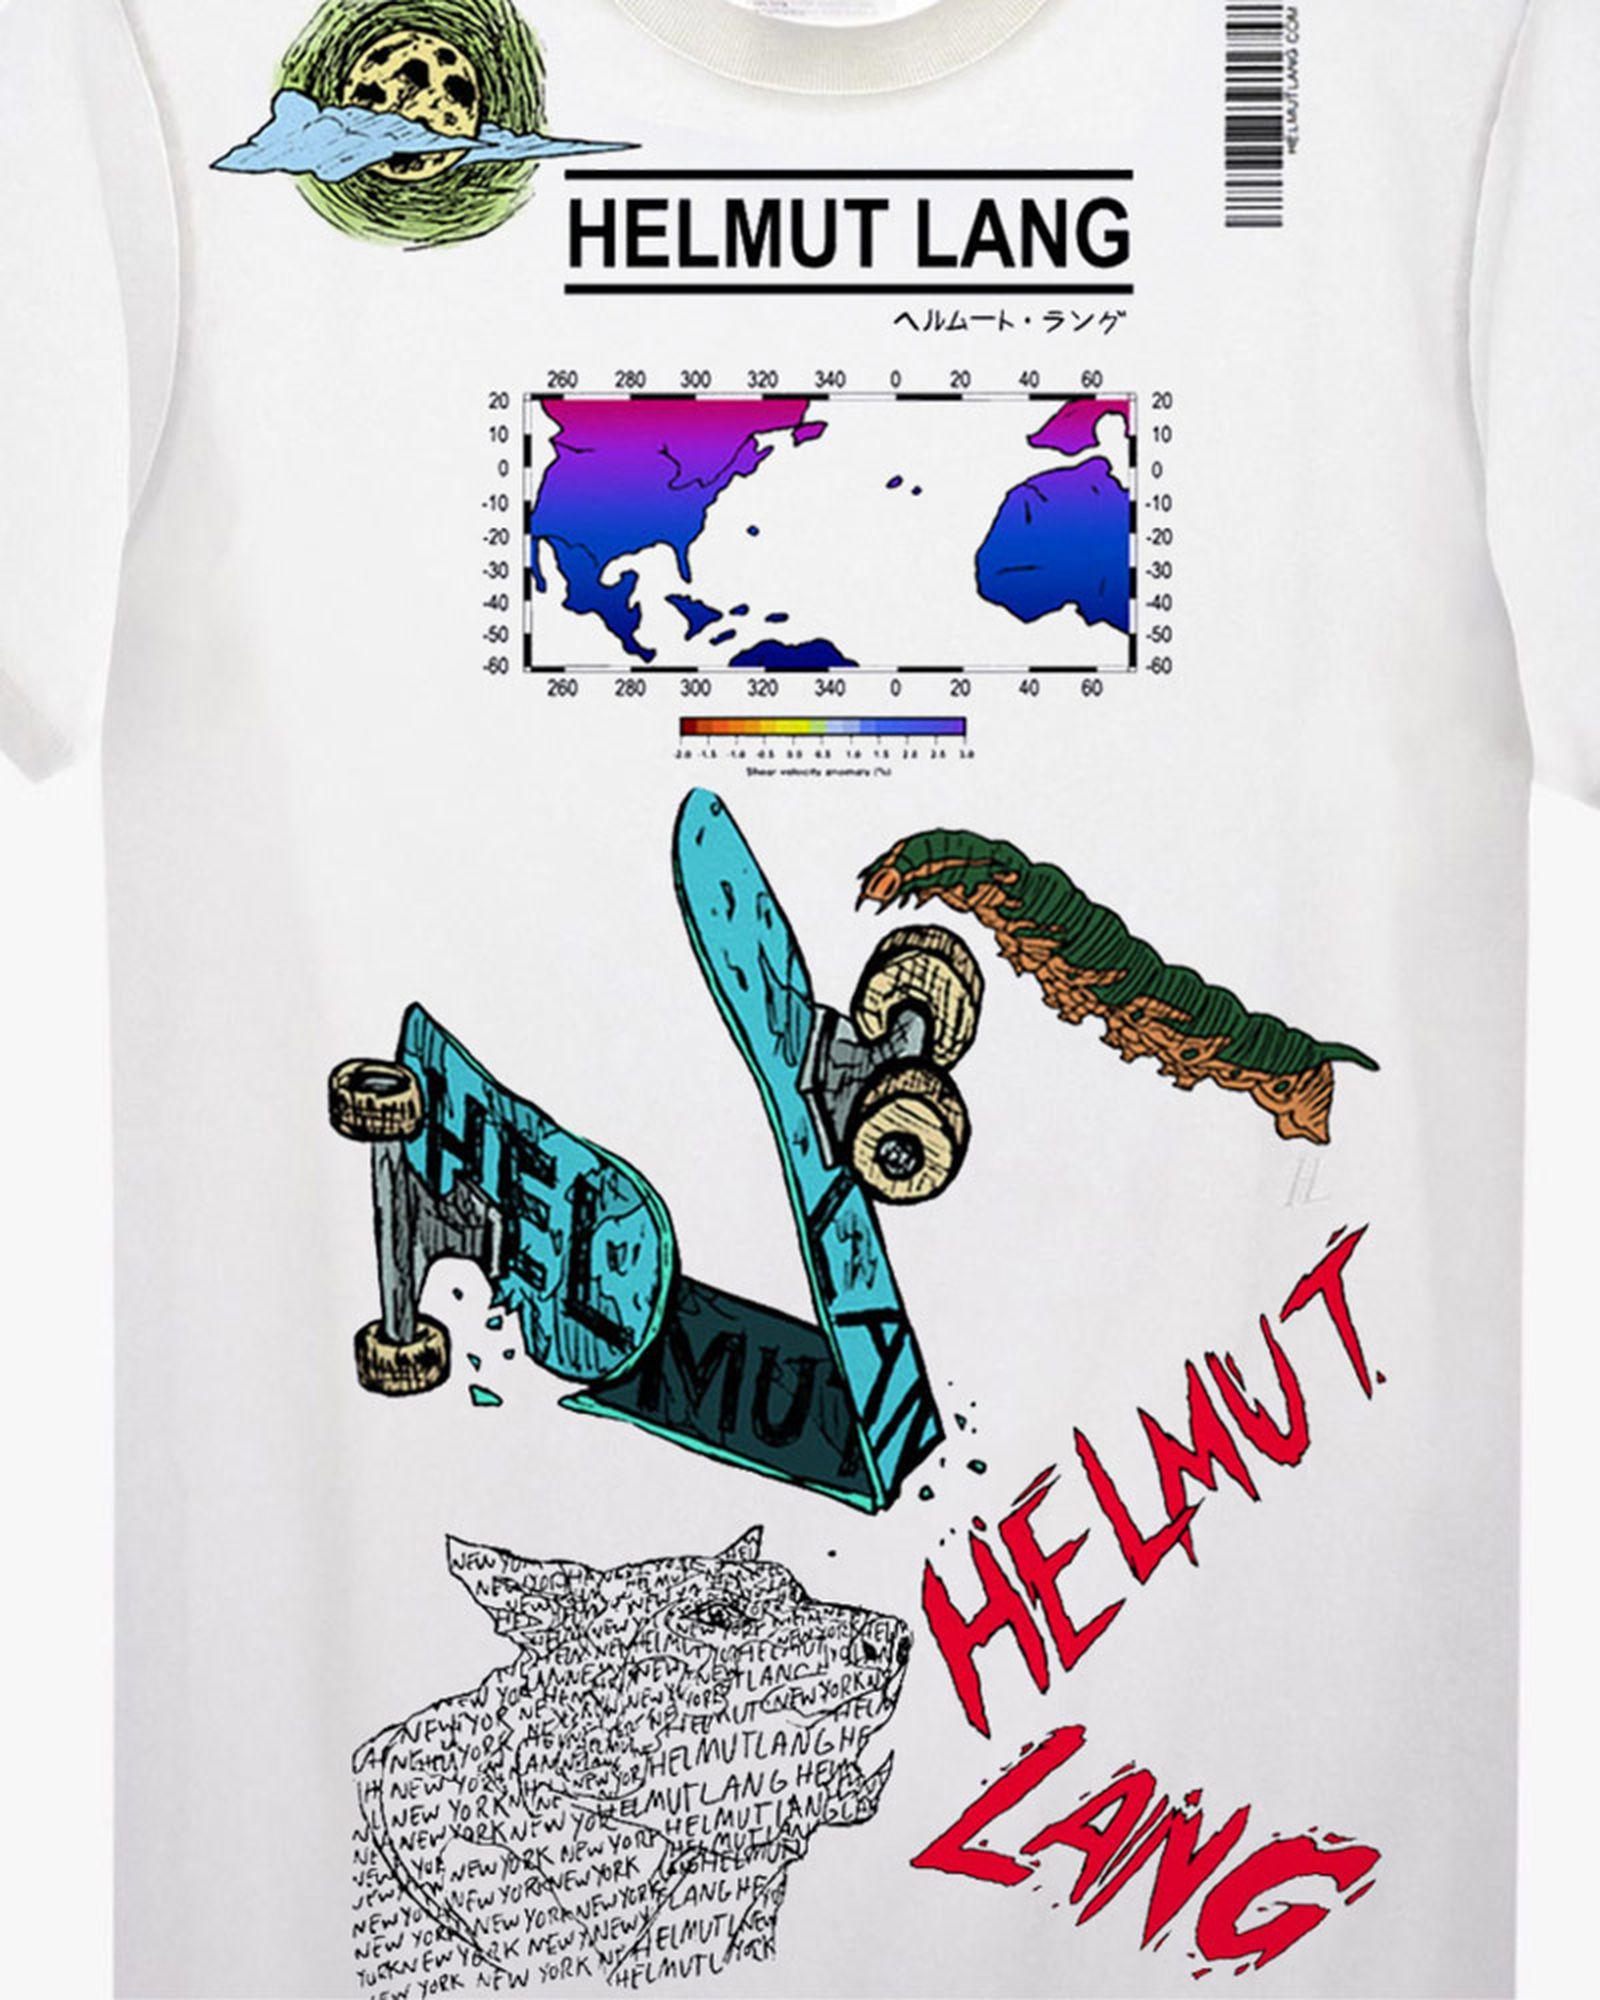 14helmut-lang-t-shirt-design-competition